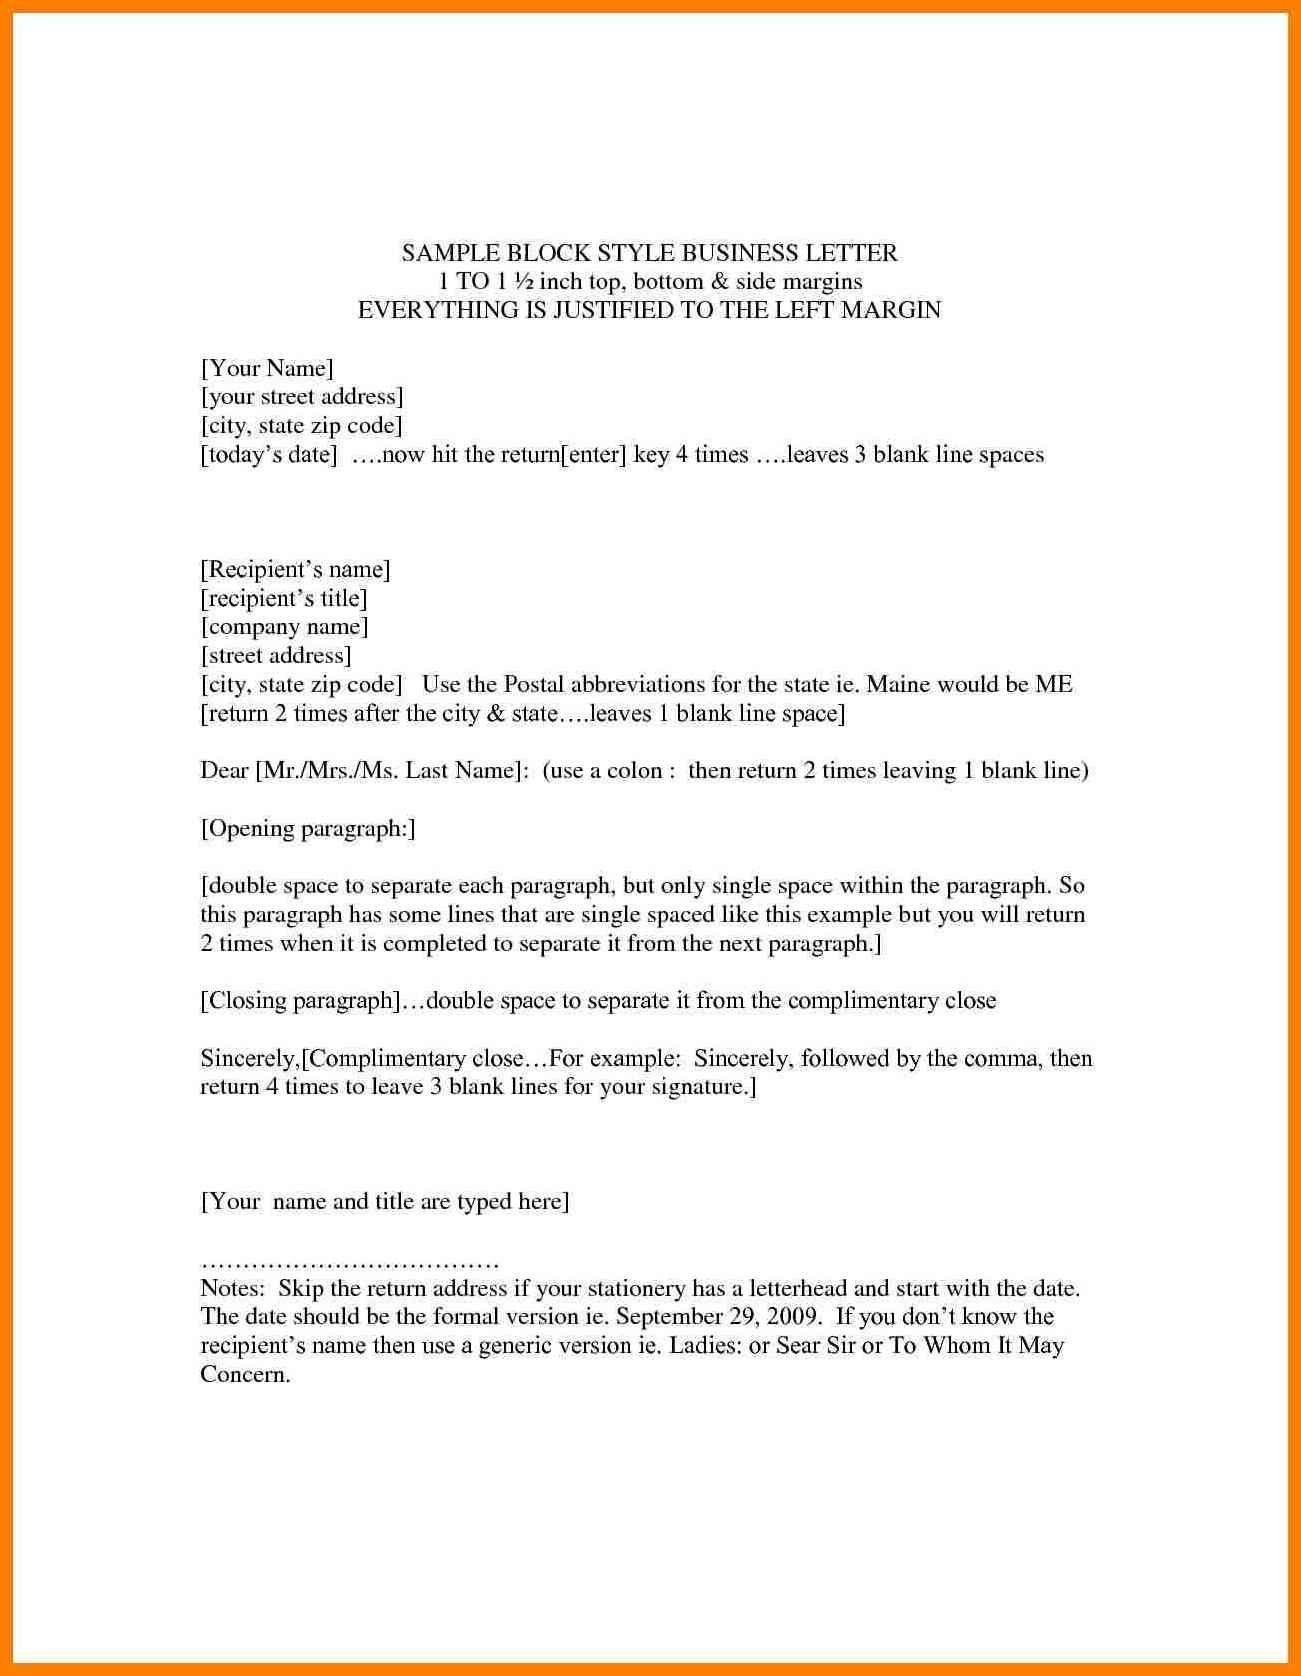 Business Letter Format Business letter format, Business